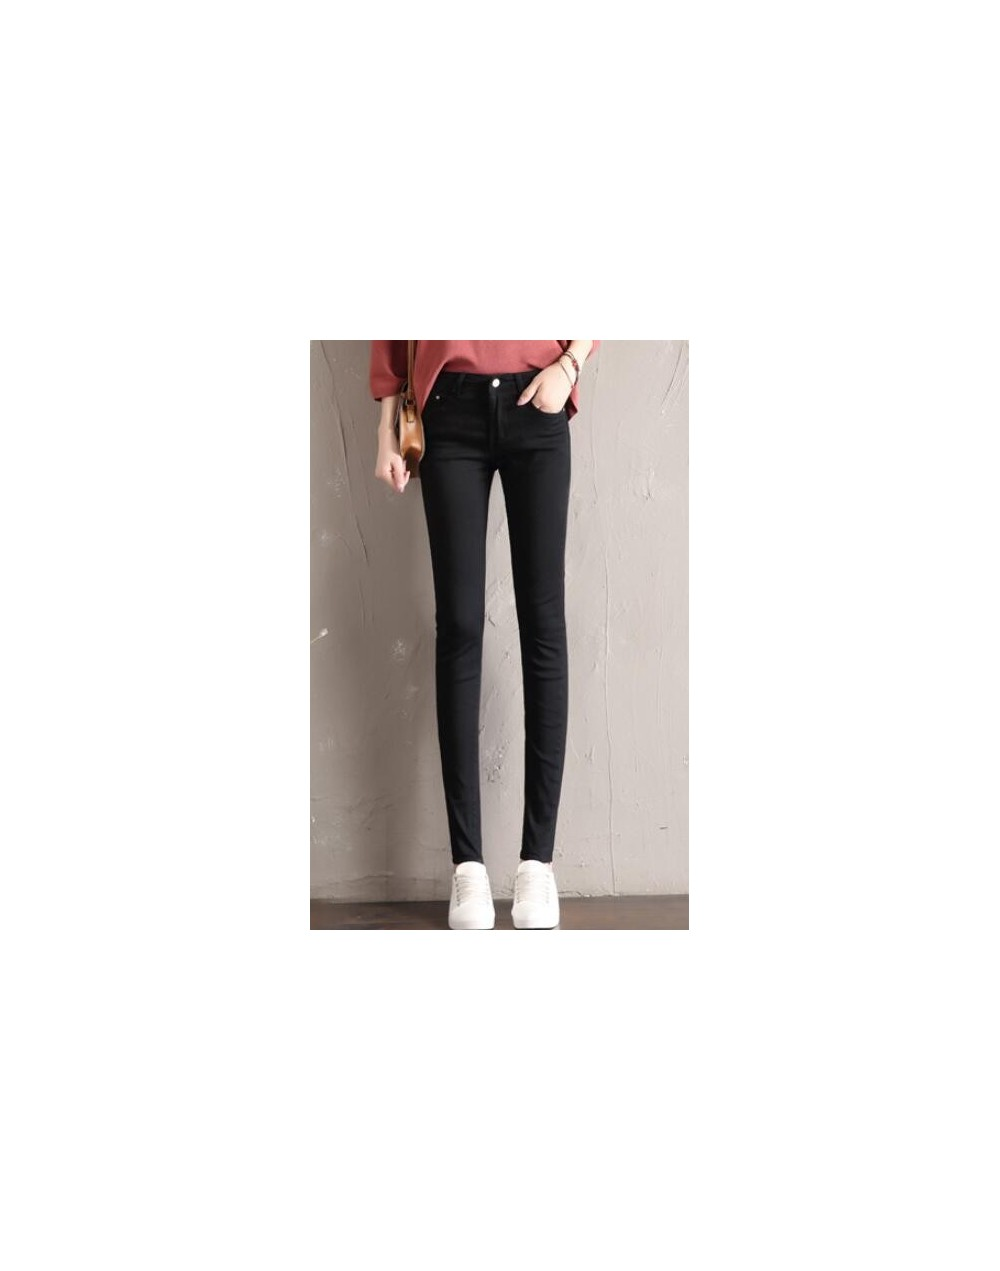 2019 Spring Summer Women Jeans Skinny Denim Pants Female Vintage Slim Casual Elastic Stretch Jeans Demin Pencil Pant Trouser...